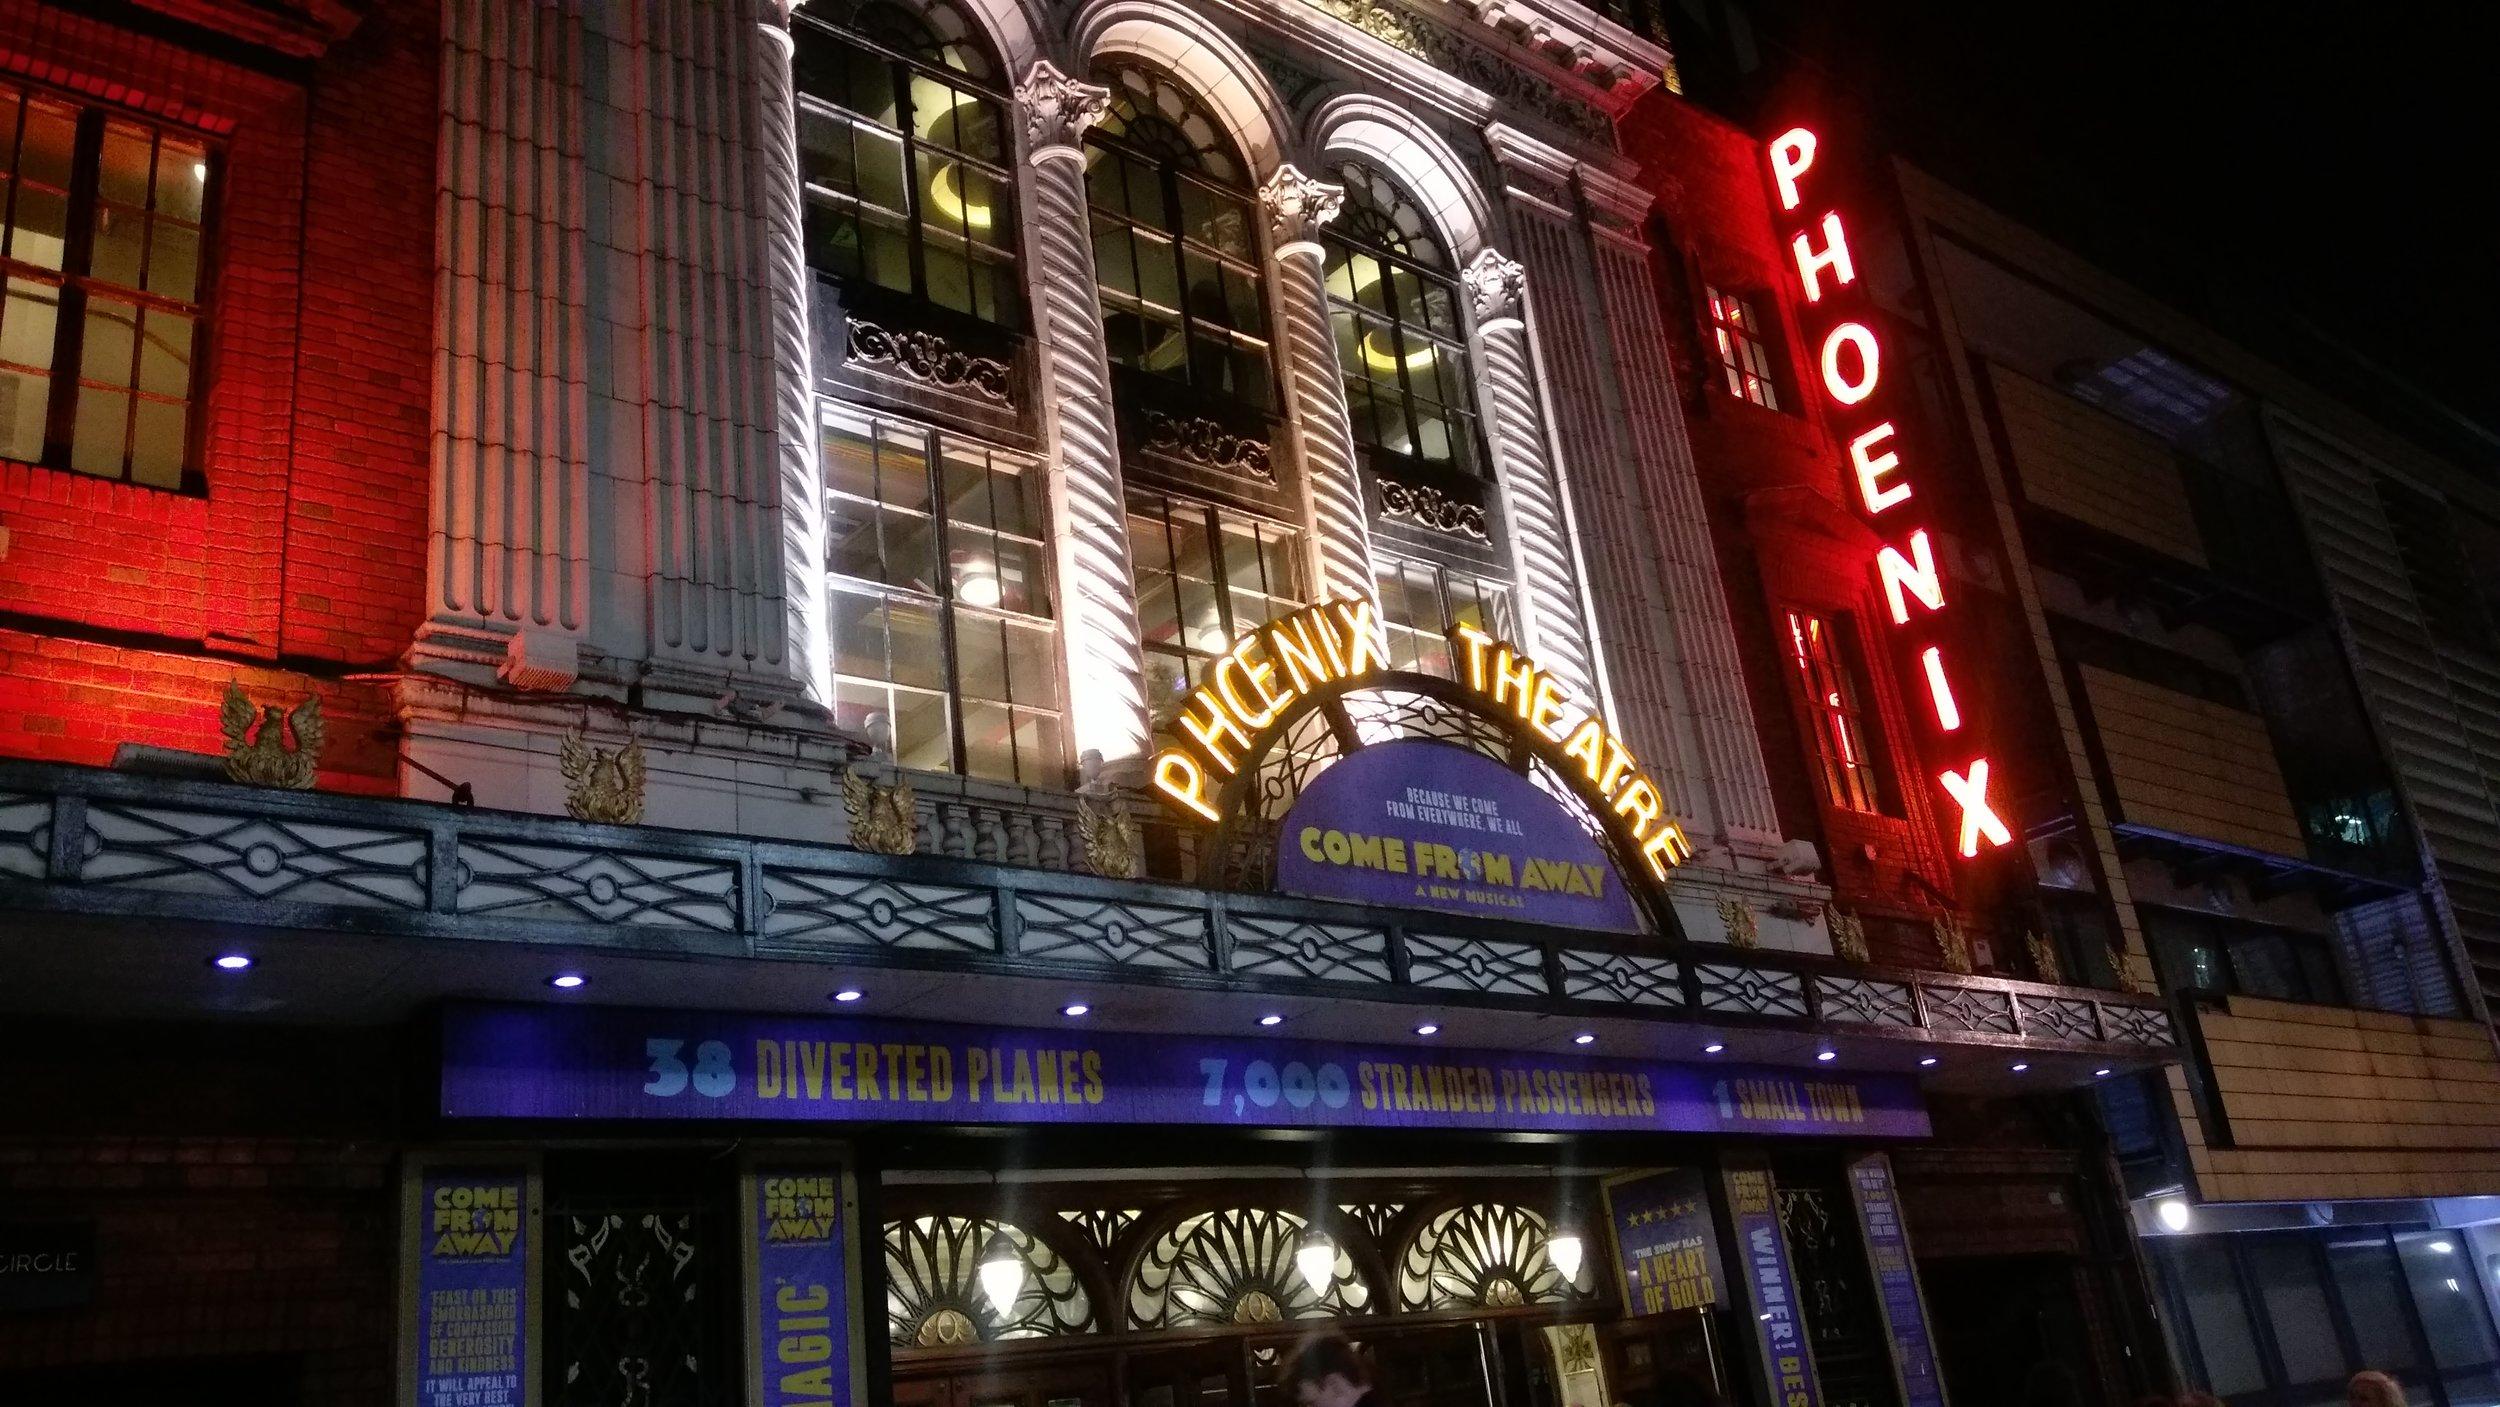 Phoenix Theatre - visited 21/02/2019